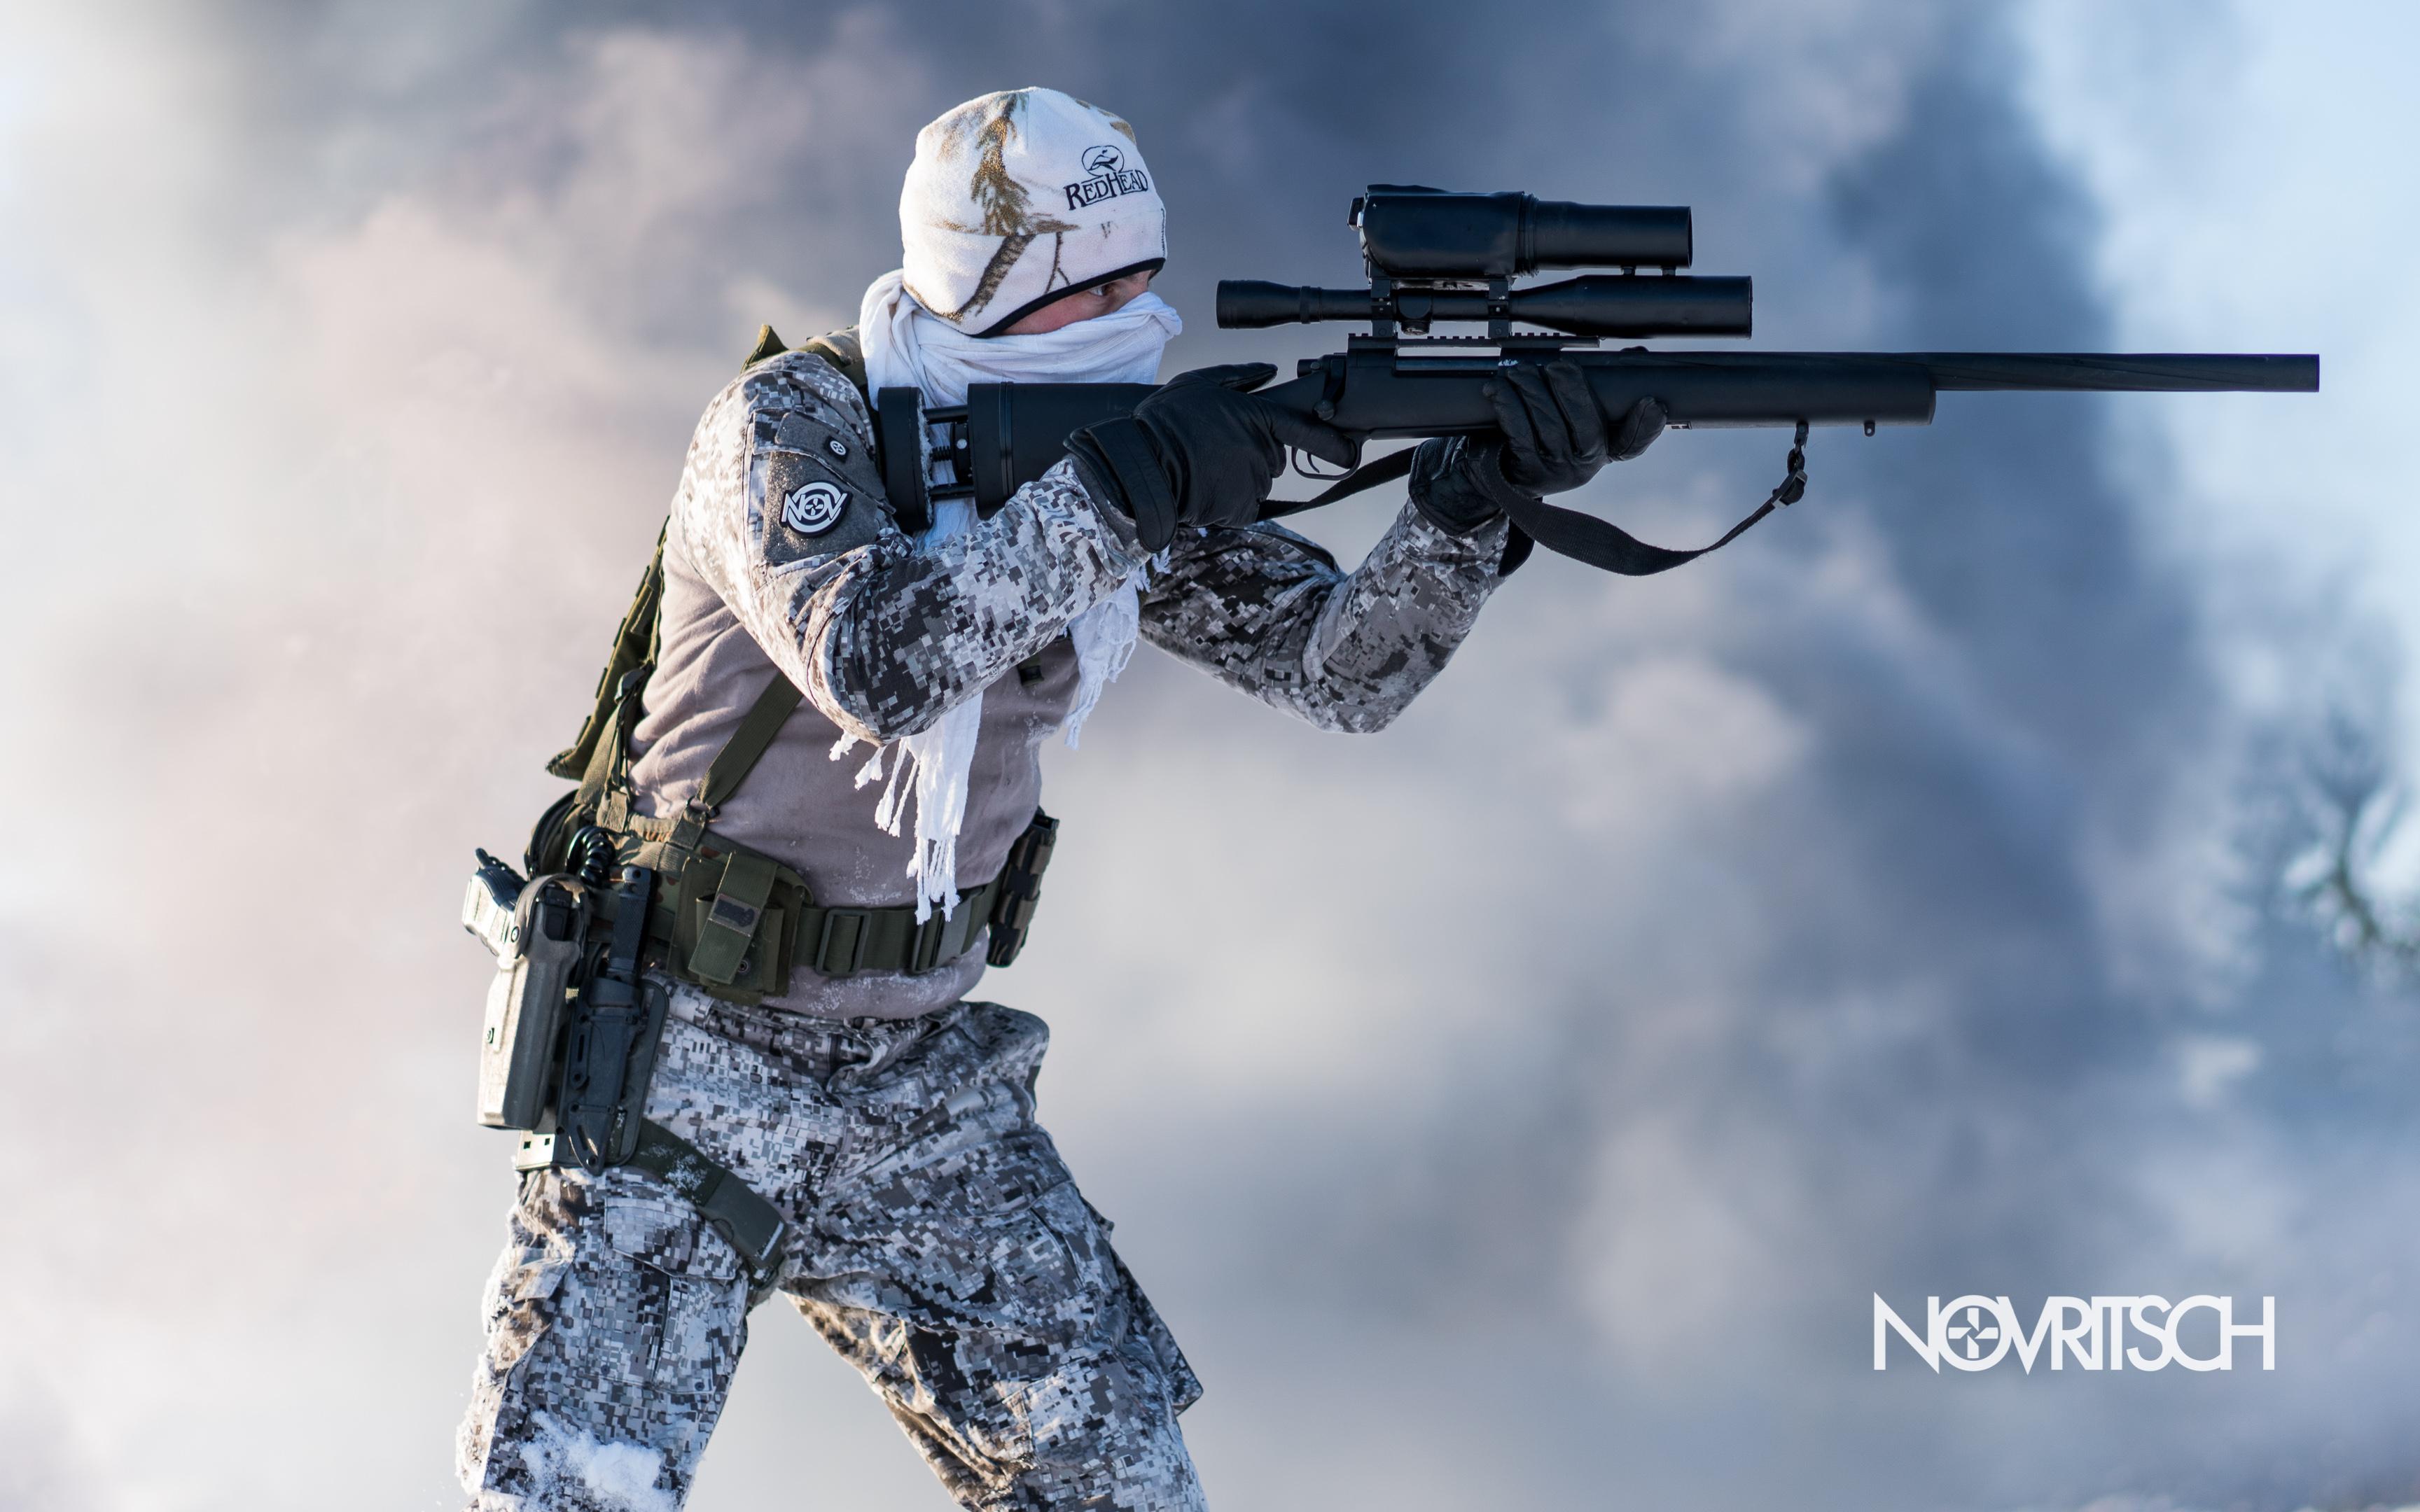 Wallpapers novritsch airsoft sniper favourites ssg24 other voltagebd Choice Image